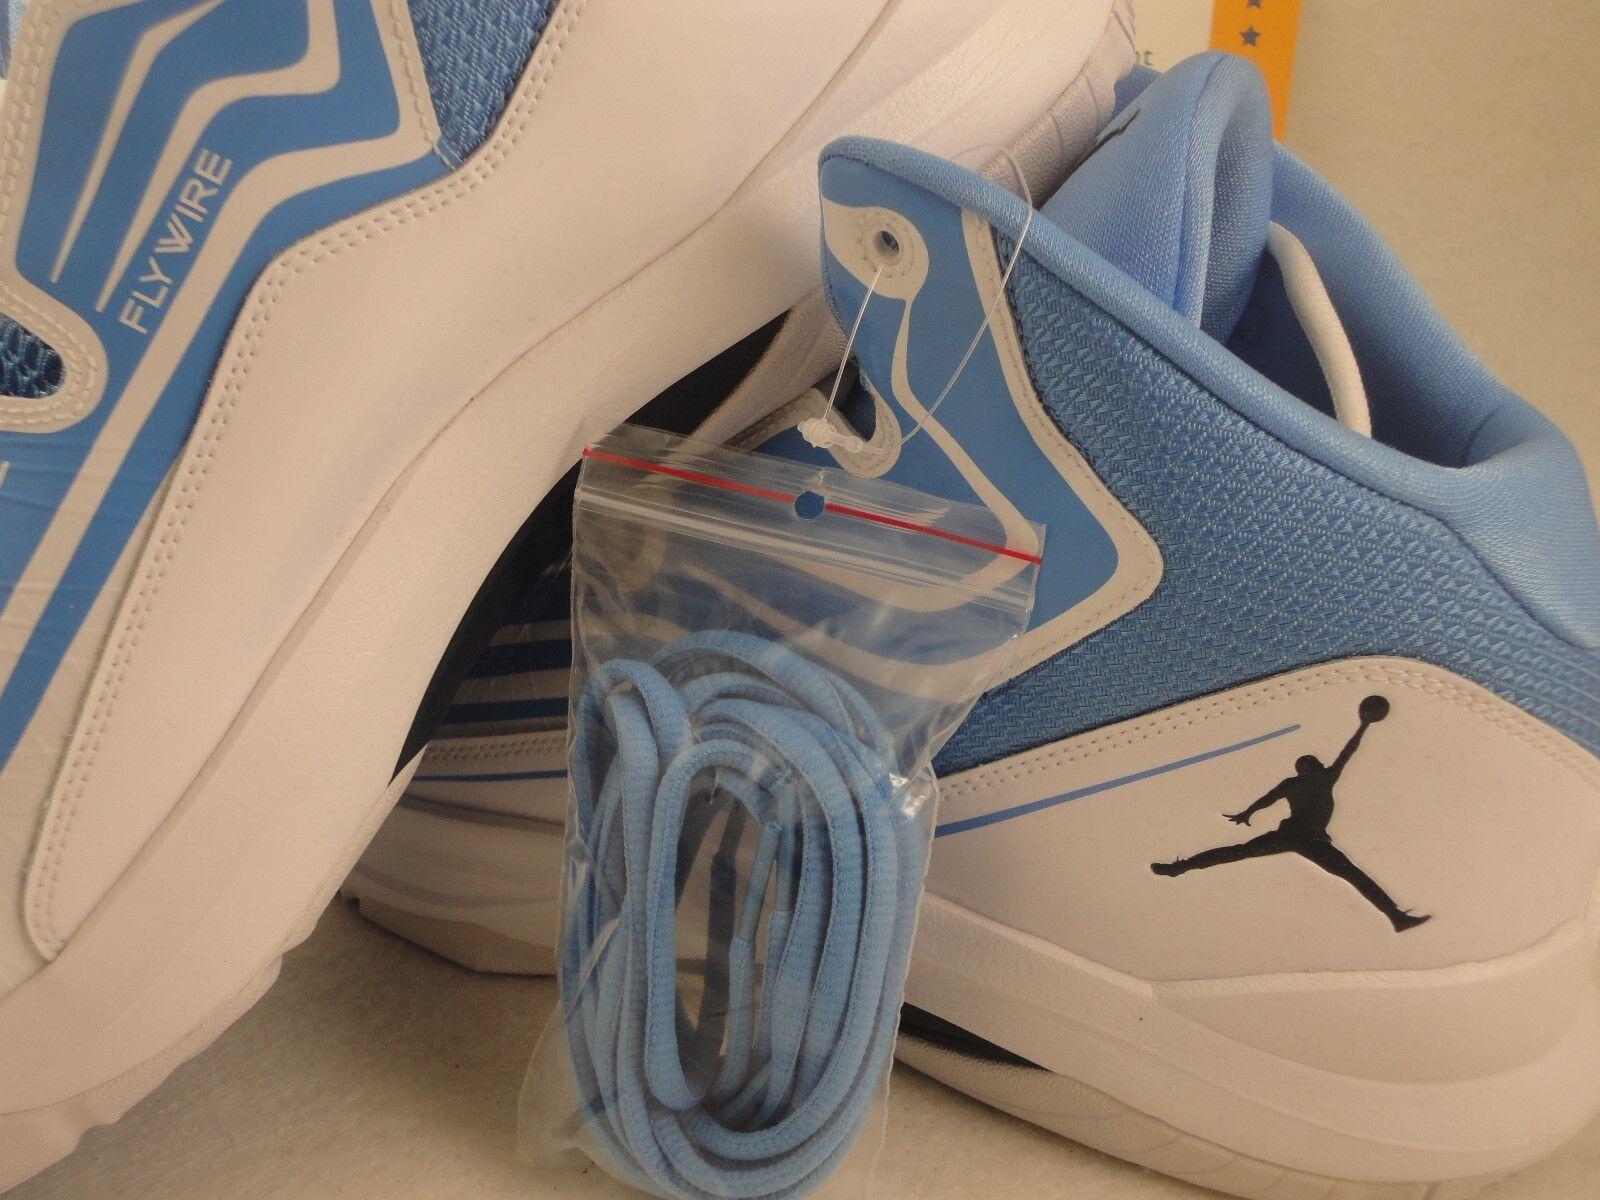 Nike Jordan Aero Mania, White / University Blue, Flywire, UNC, Comfortable Comfortable and good-looking